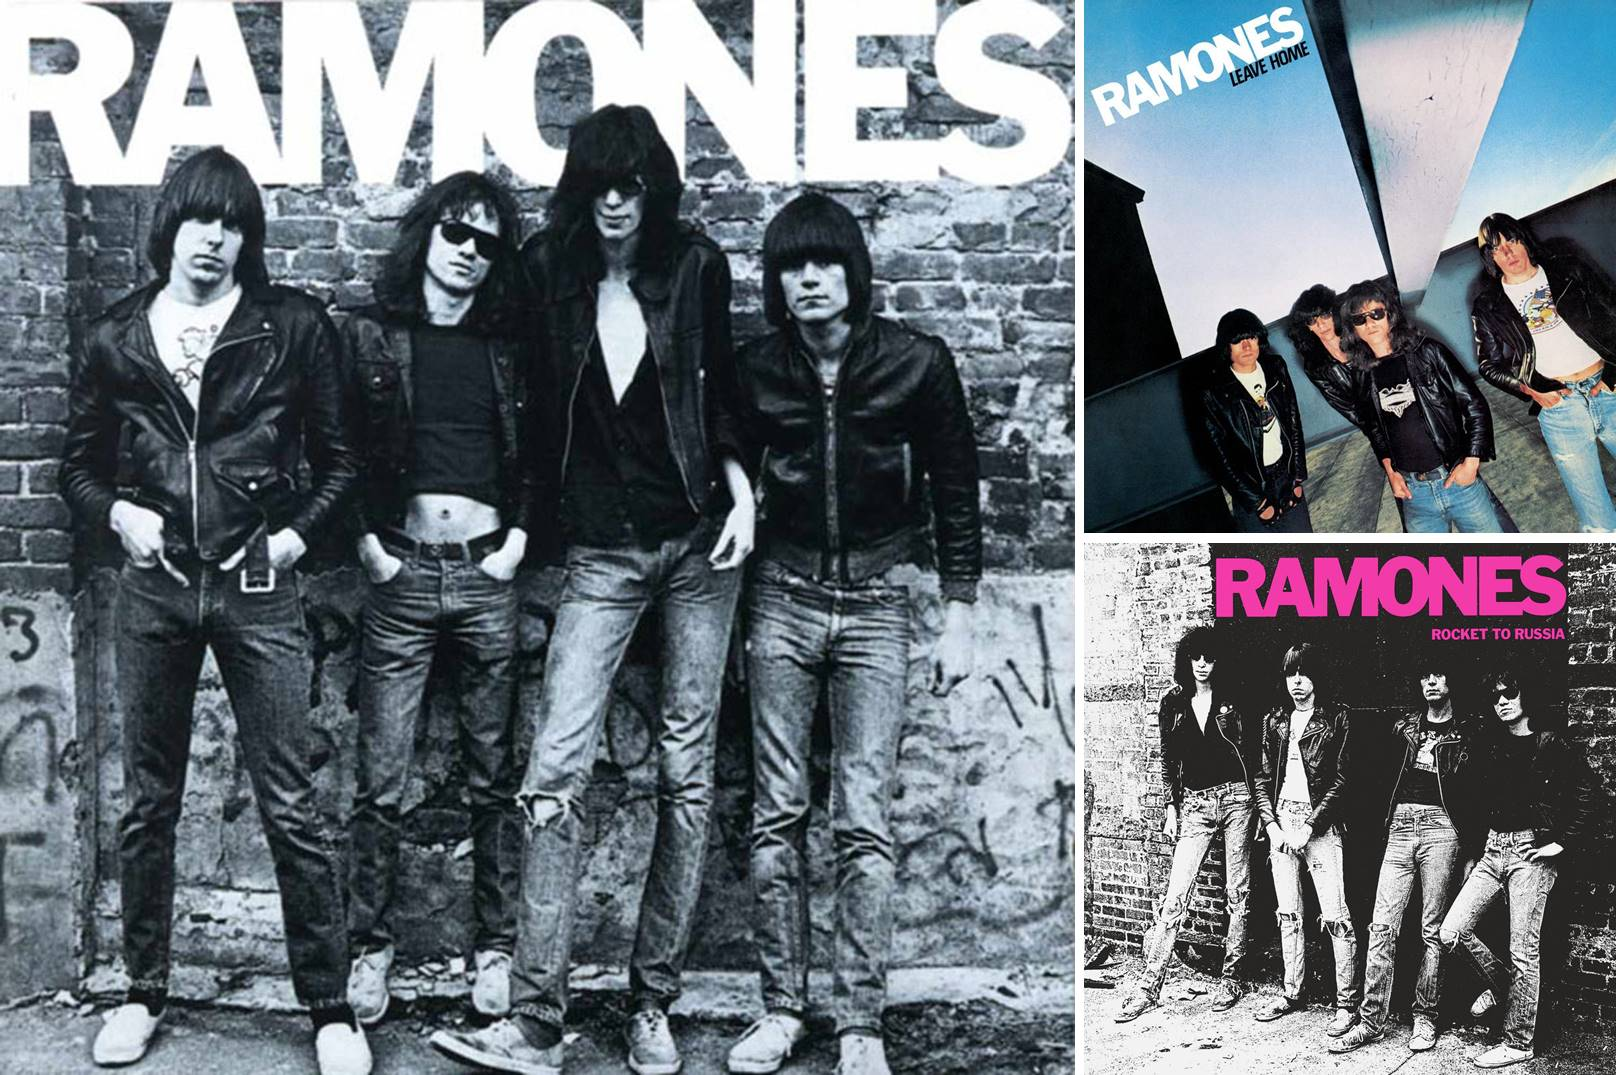 Albumism_Ramones_Vinyl_Reissues_MainImage.jpg